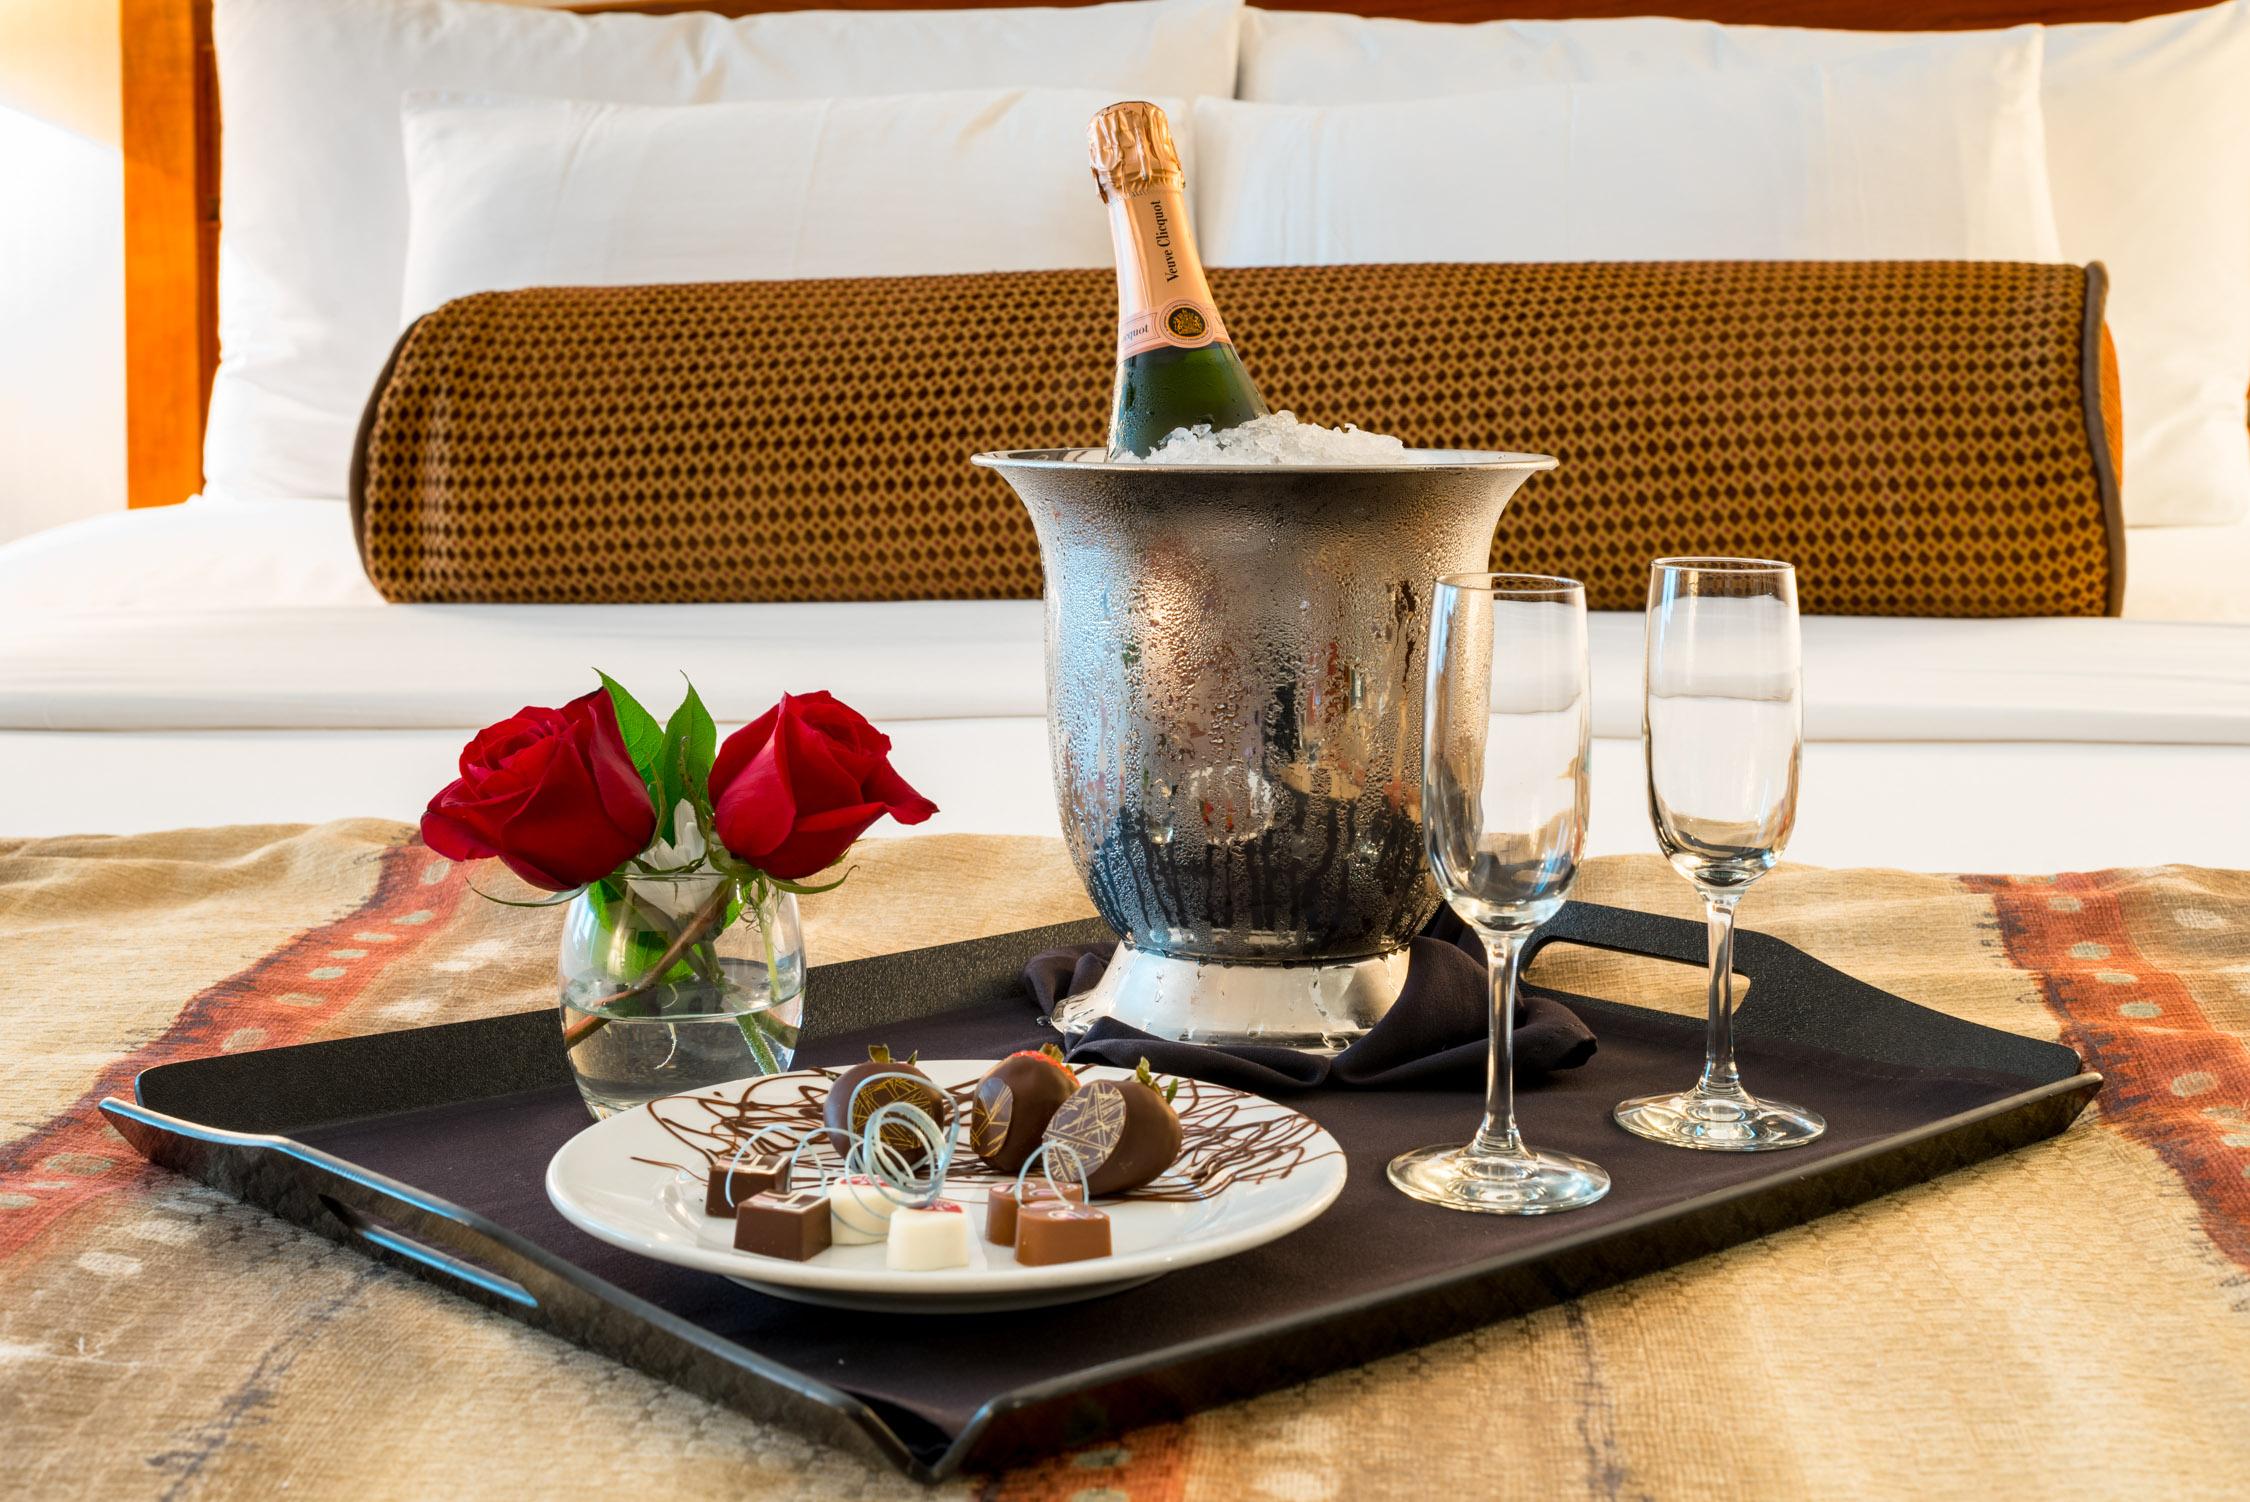 Ohhh lala...a bit of romance at  Alyeska Resort in Alaska